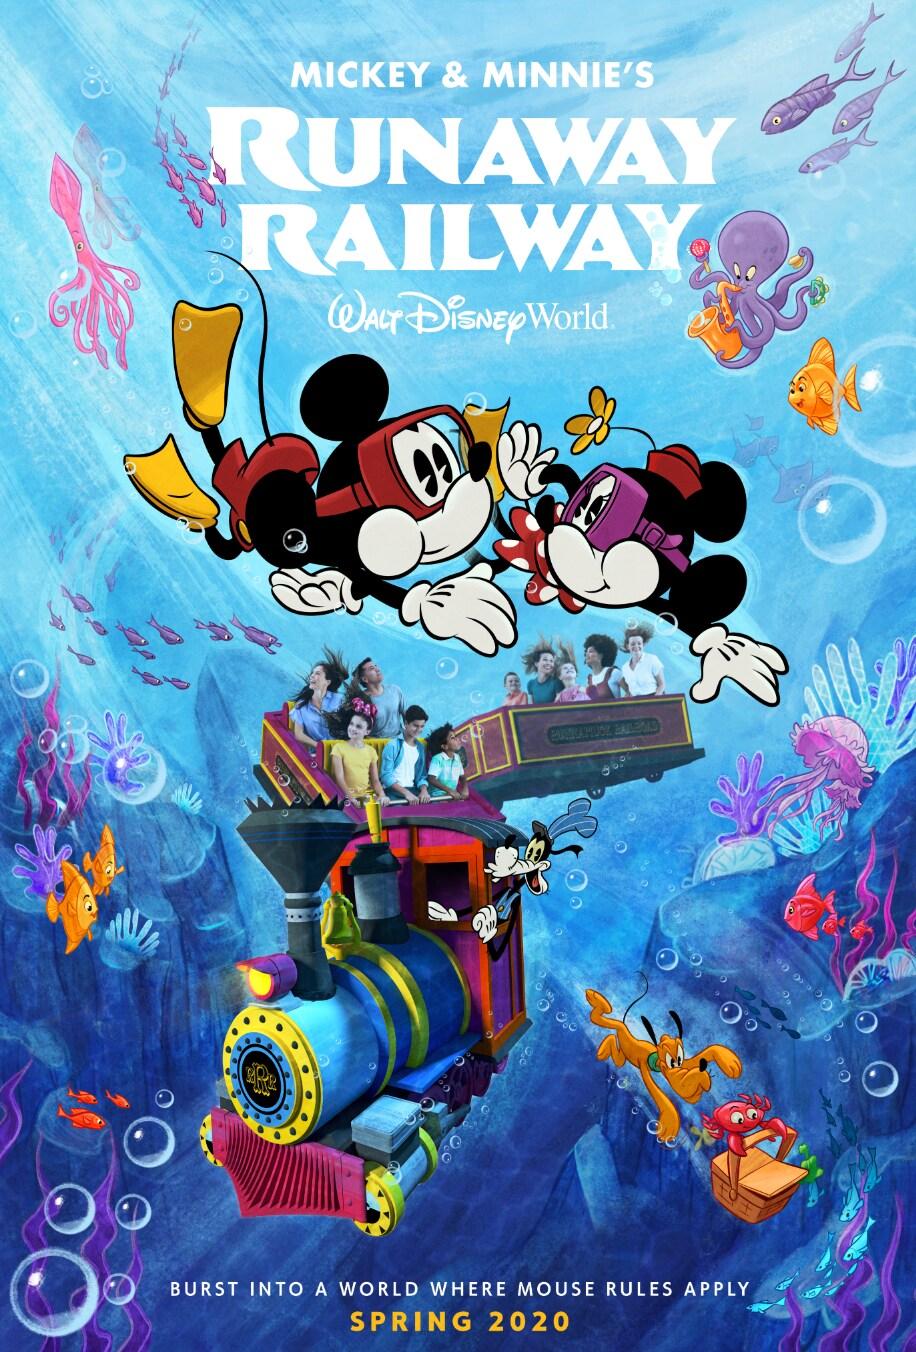 Mickey & Minnie's Runaway Railway Poster